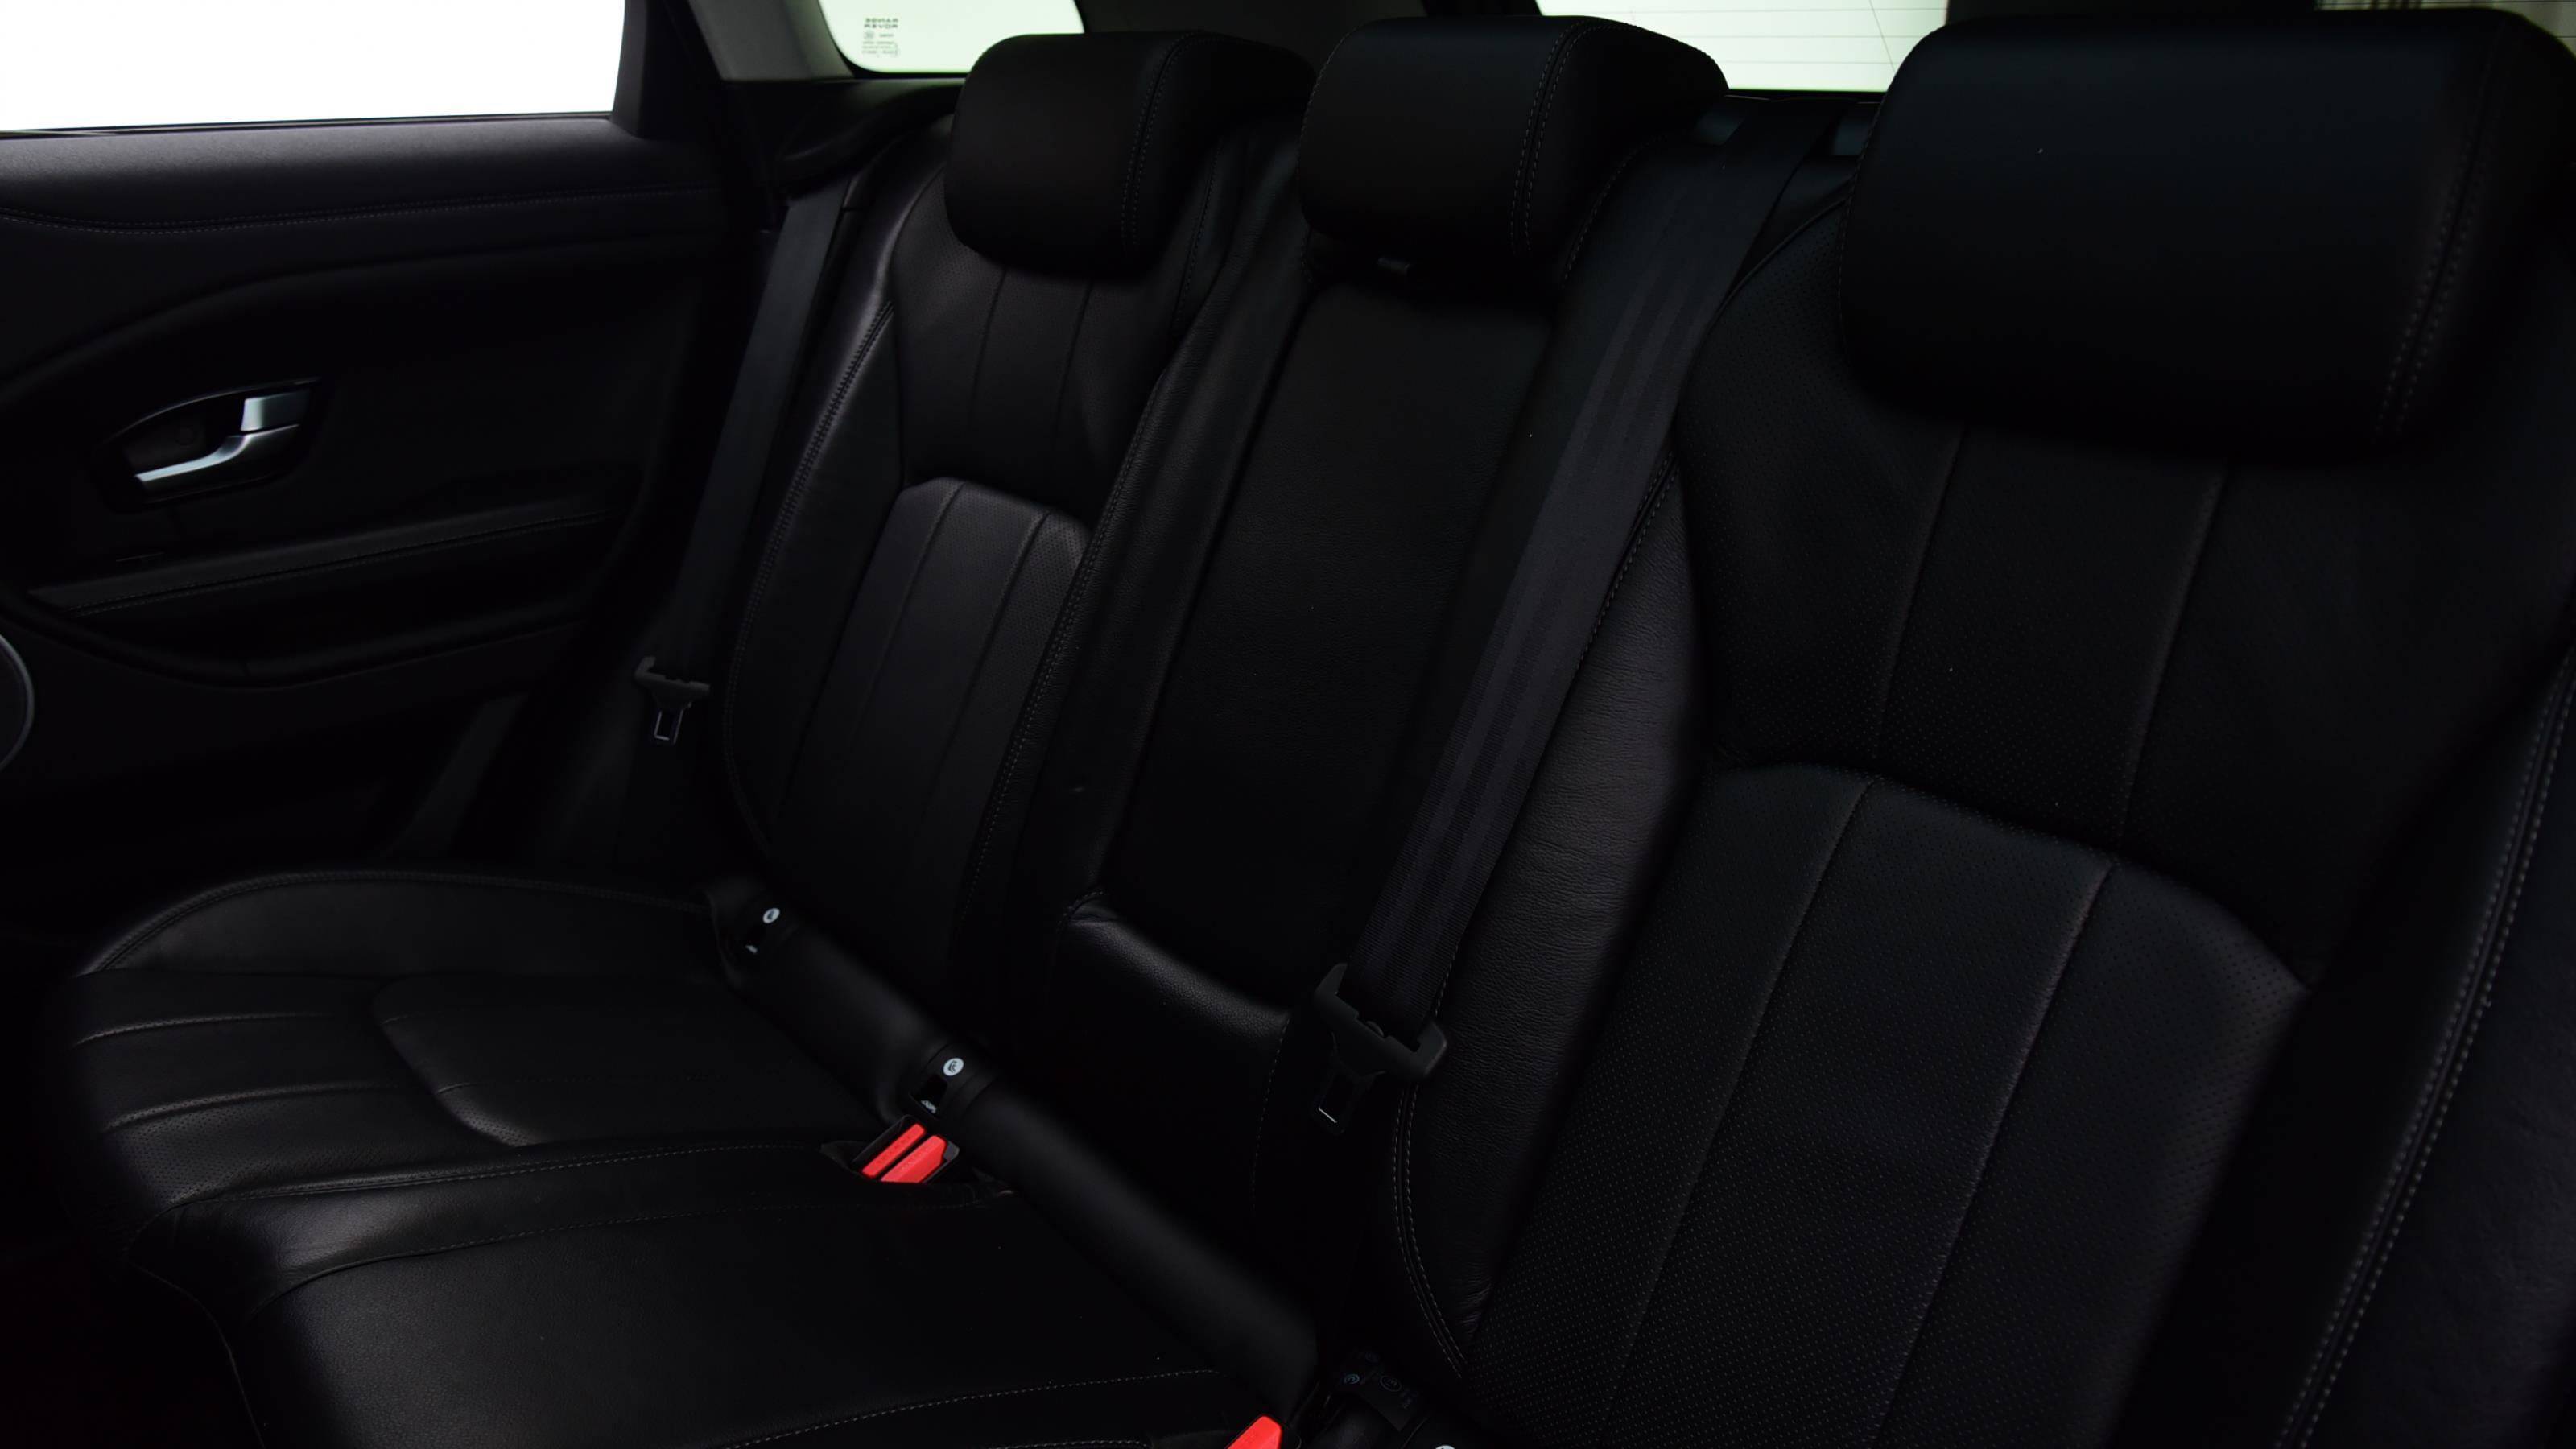 Used 16 Land Rover RANGE ROVER EVOQUE 2.0 eD4 SE Tech 5dr 2WD BLACK at Saxton4x4